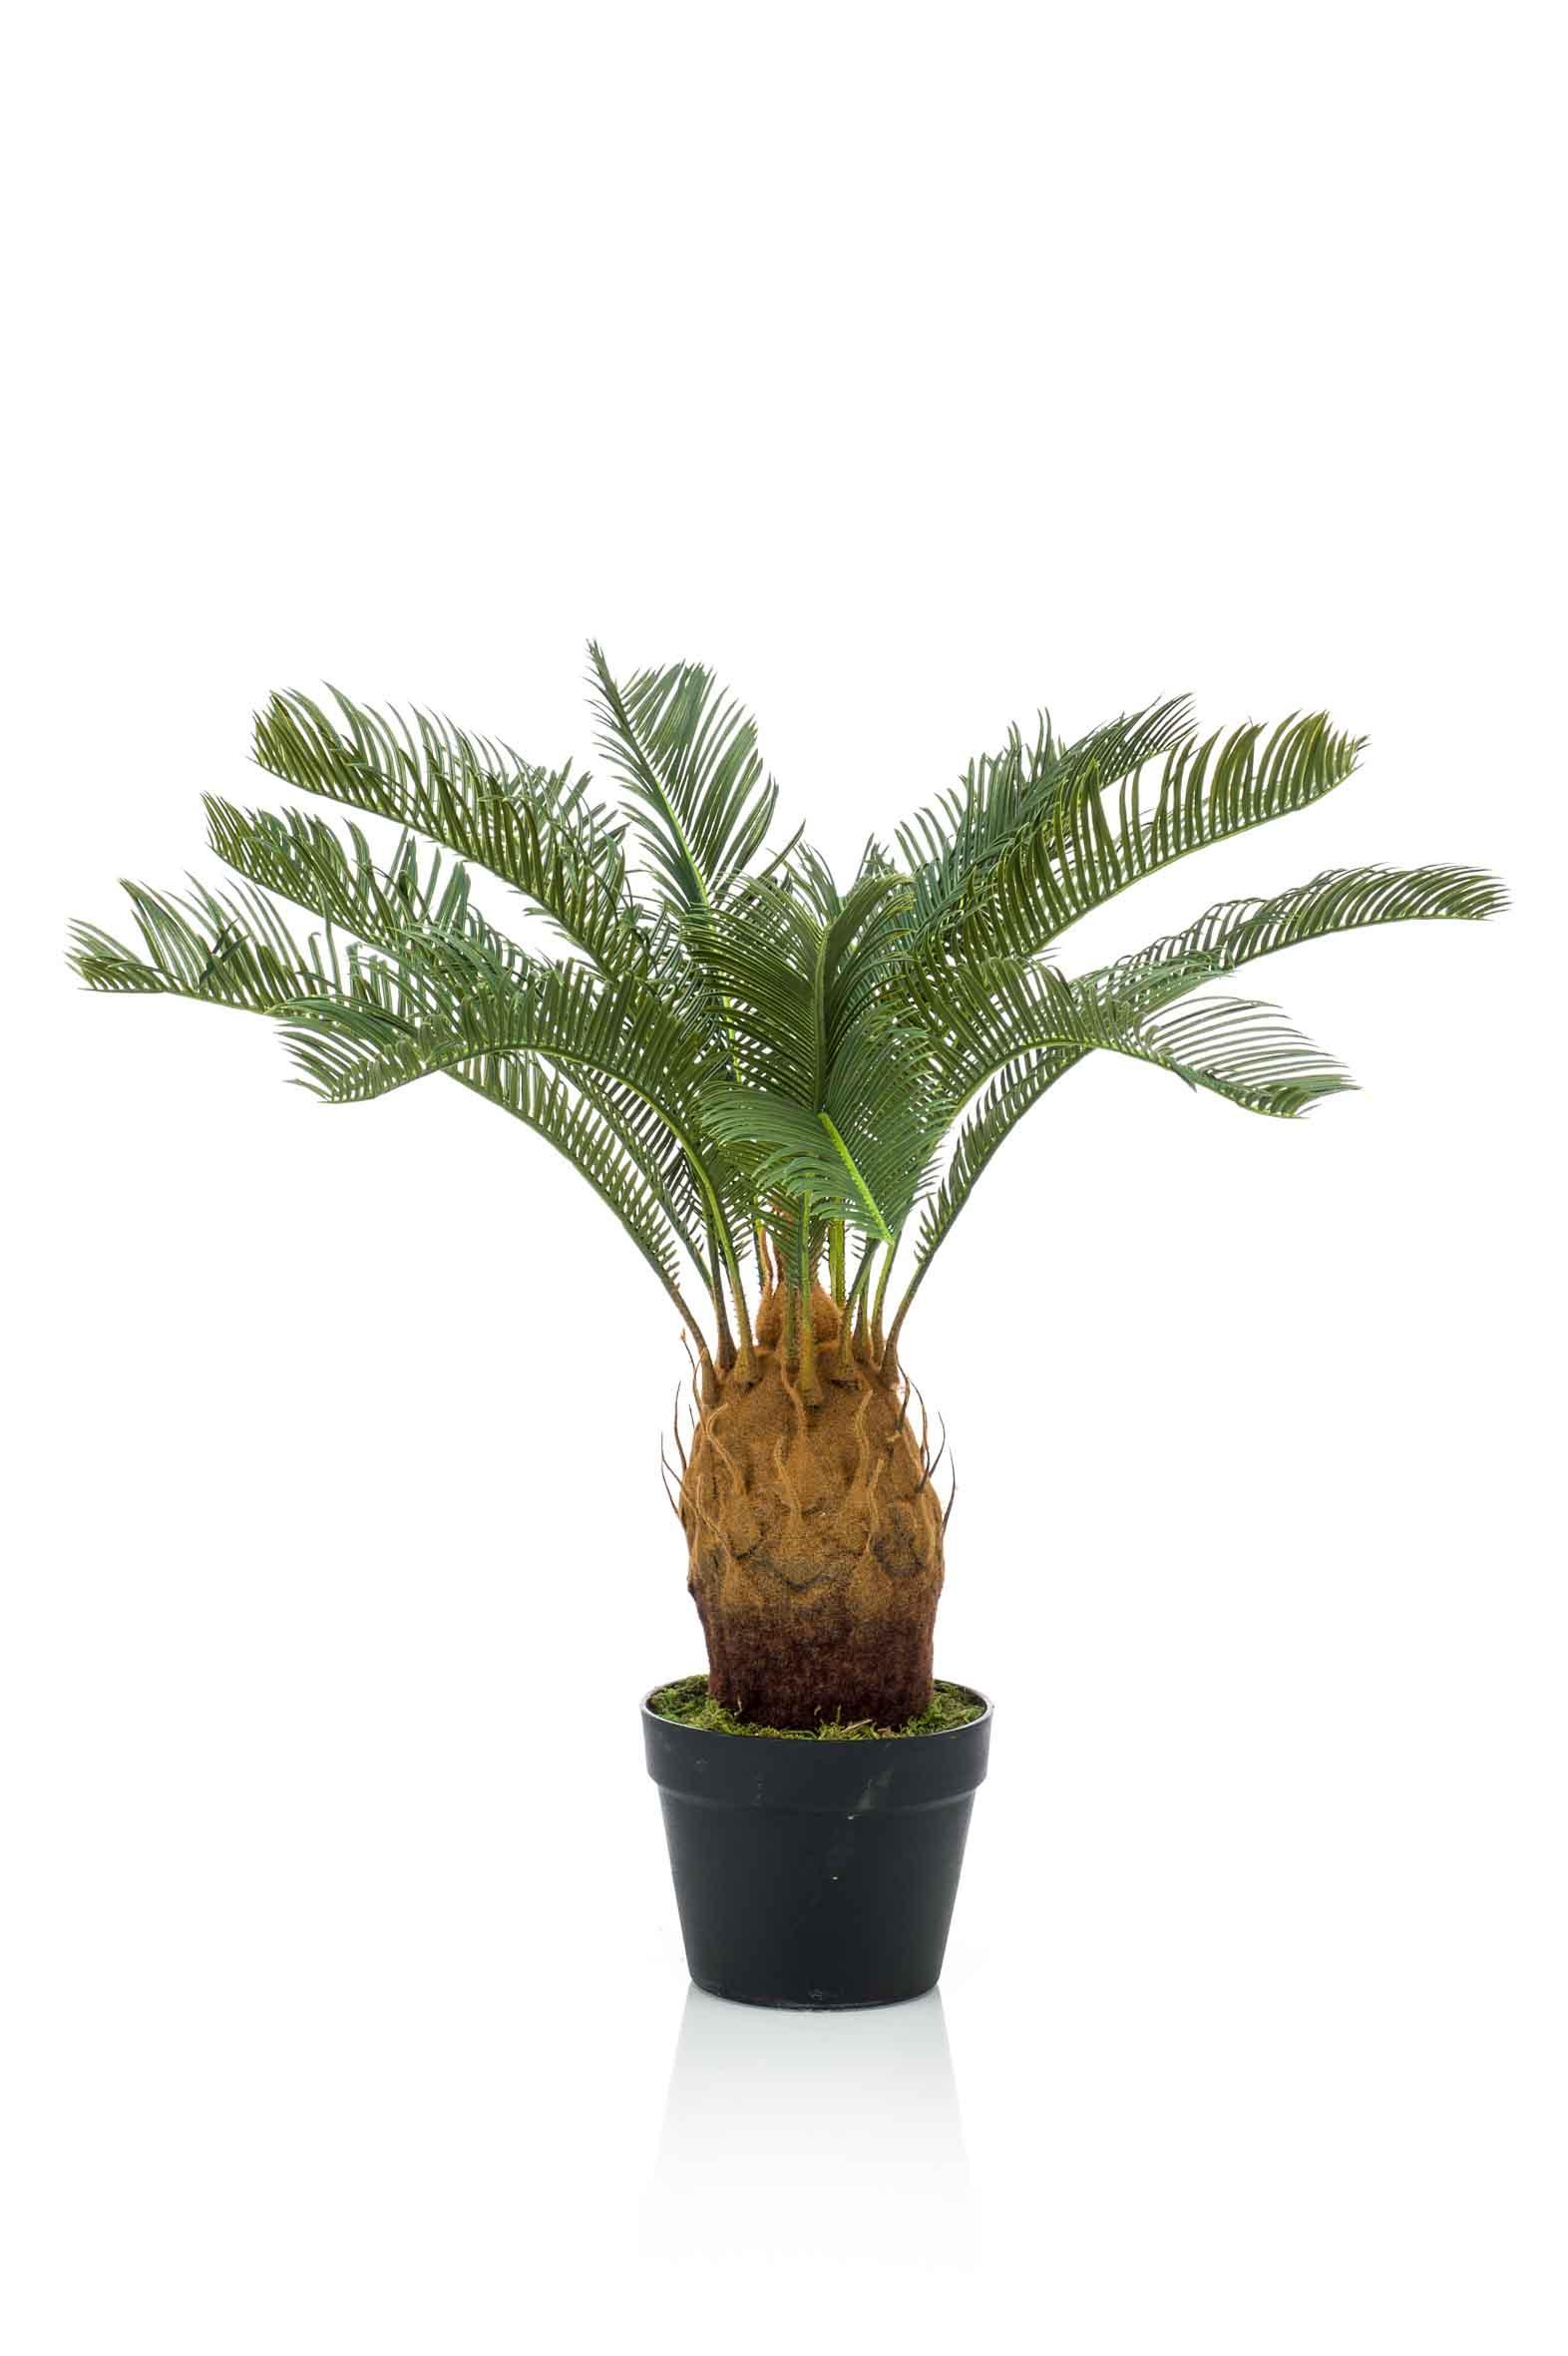 cycas revoluta palmfarn kunstpalme im plastiktopf terrapalme heim und gartenshop. Black Bedroom Furniture Sets. Home Design Ideas